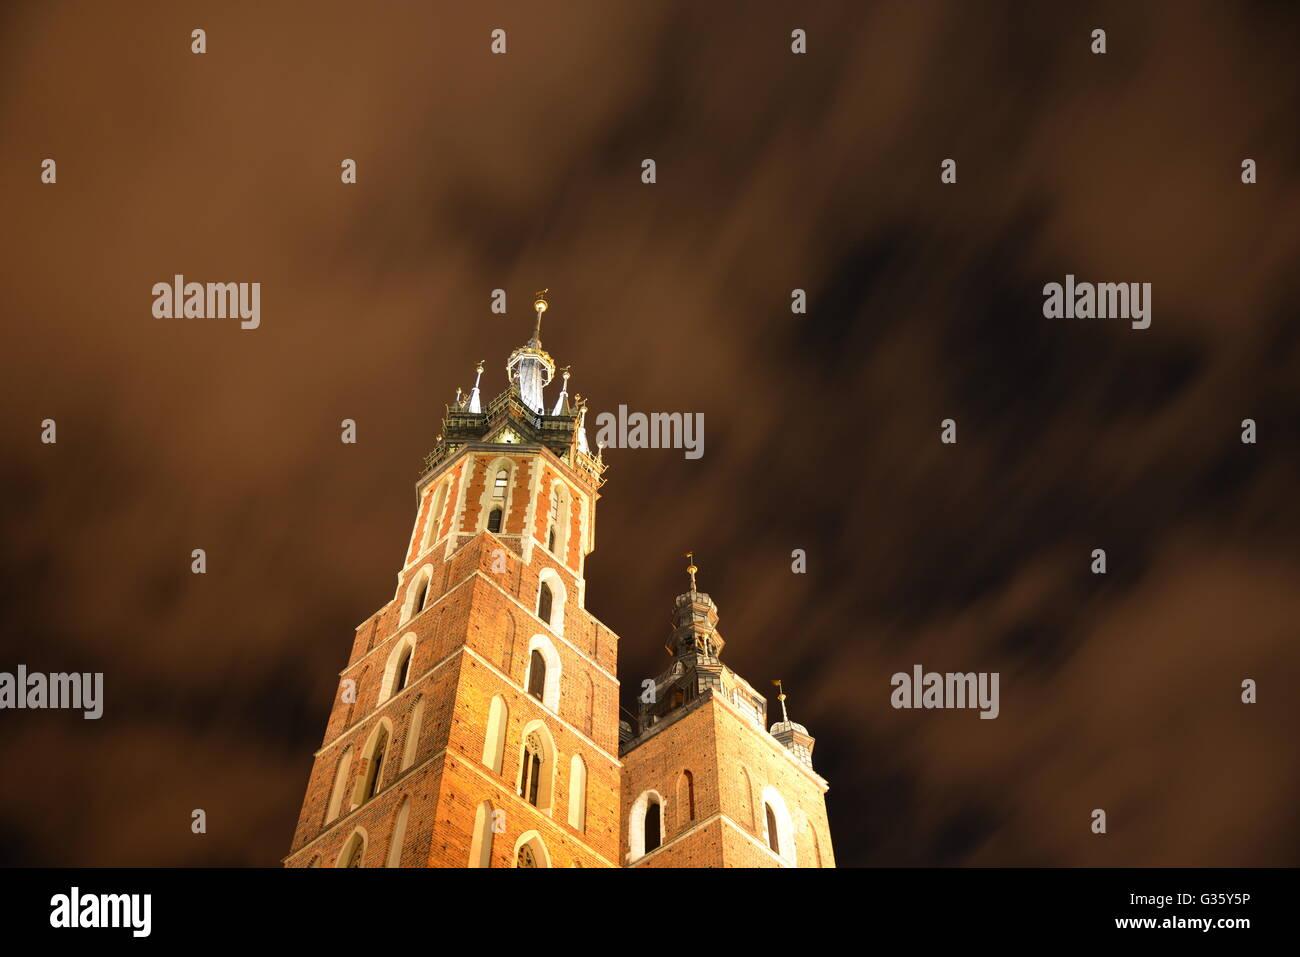 Krakow's famous St. Mary Basilica in Krakow at night (St. Mary's) - Stock Image